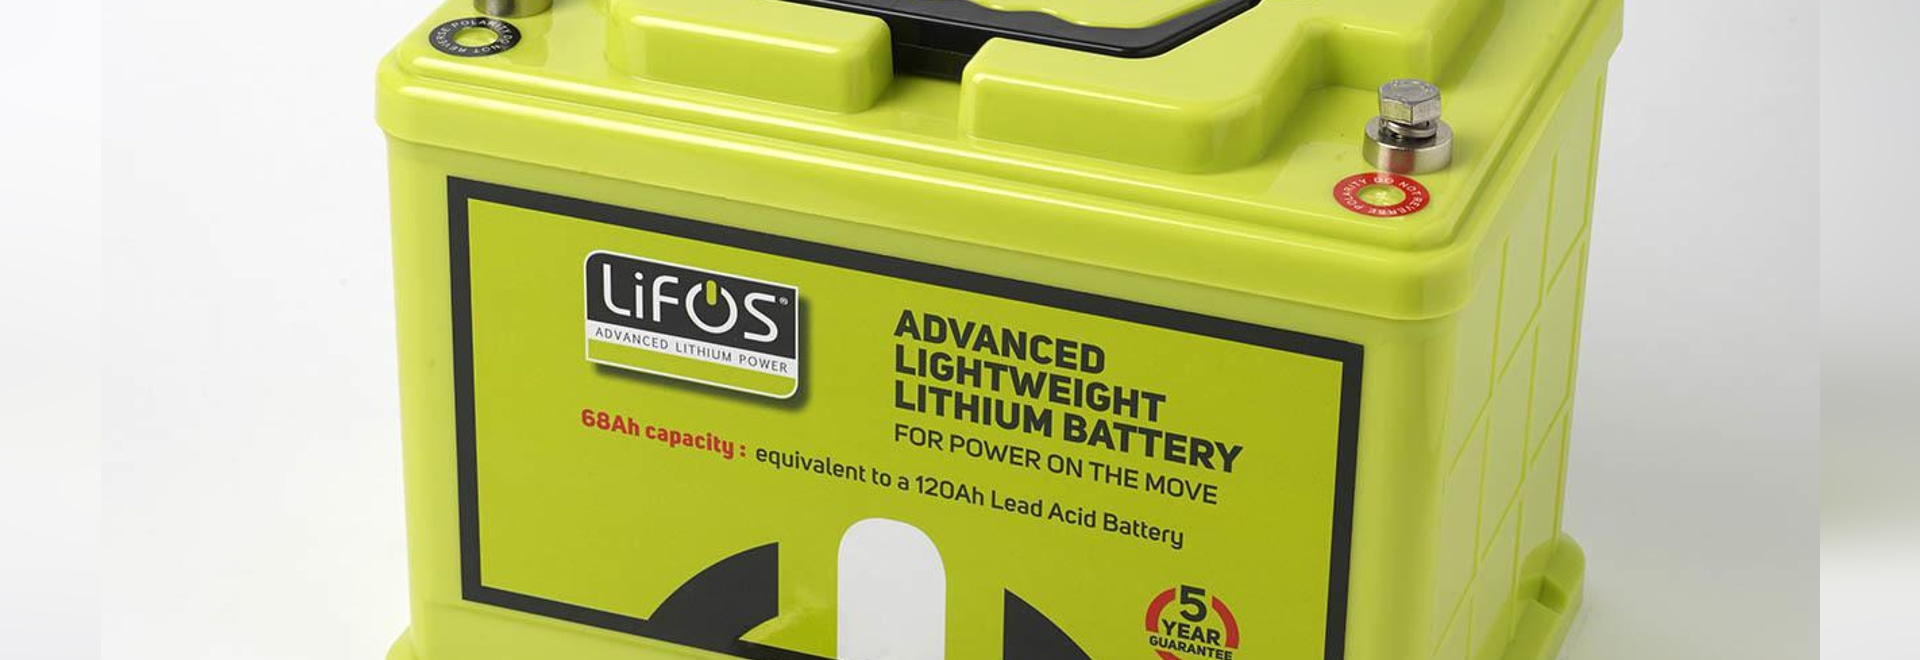 The new LiFOS lithium battery Photo: Solar Technology